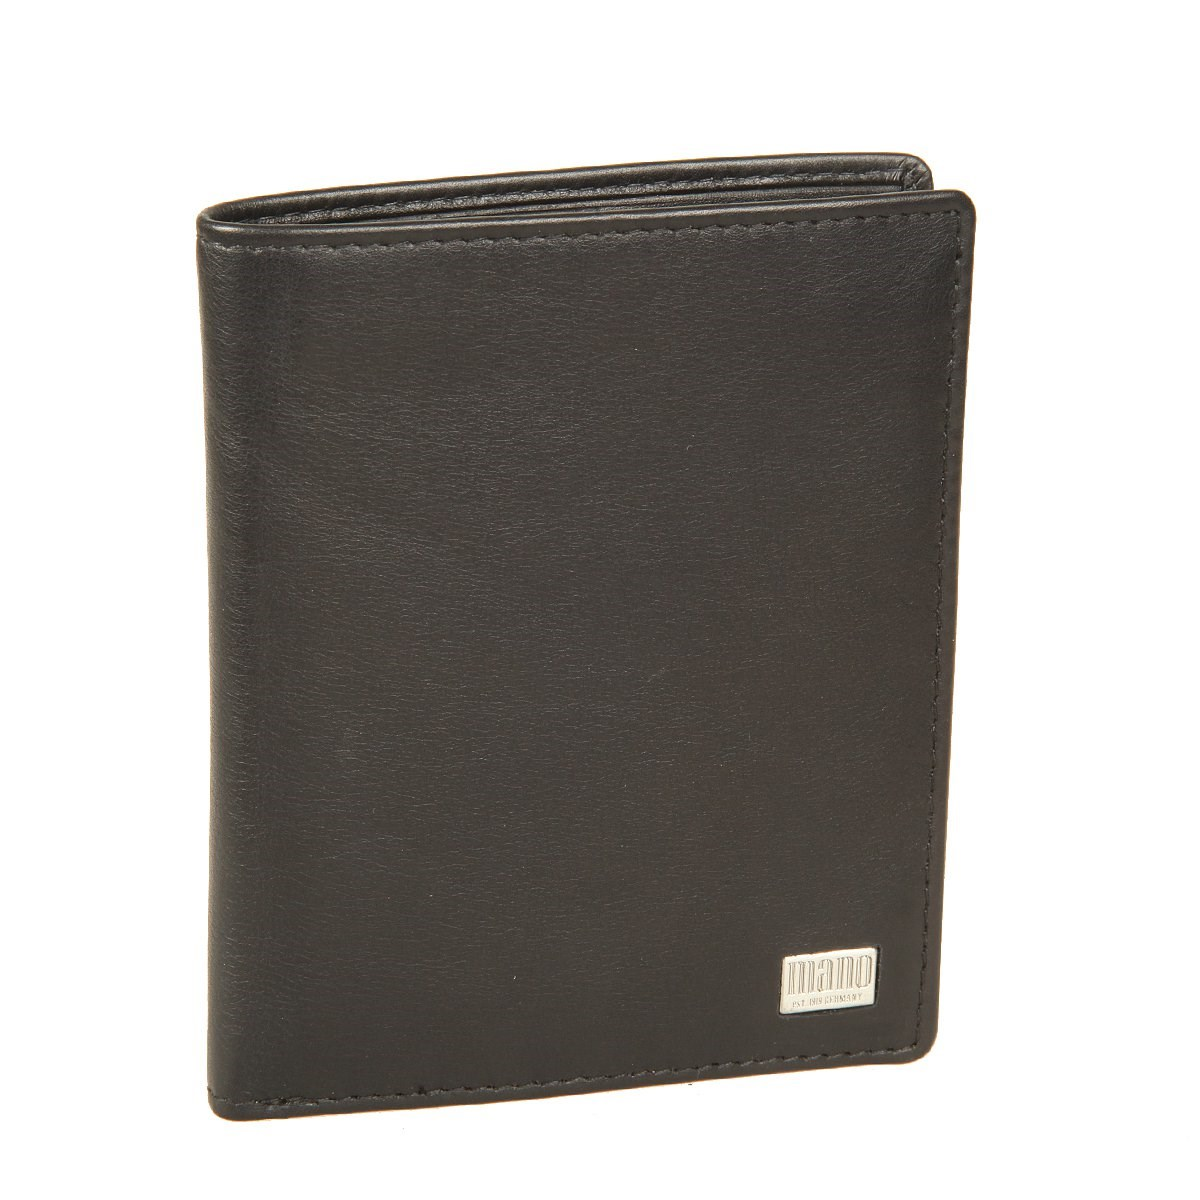 Coin Purse Mano 15804 Linea black 2017 hottest women short design gradient color coin purse cute ladies wallet bags pu leather handbags card holder clutch purse